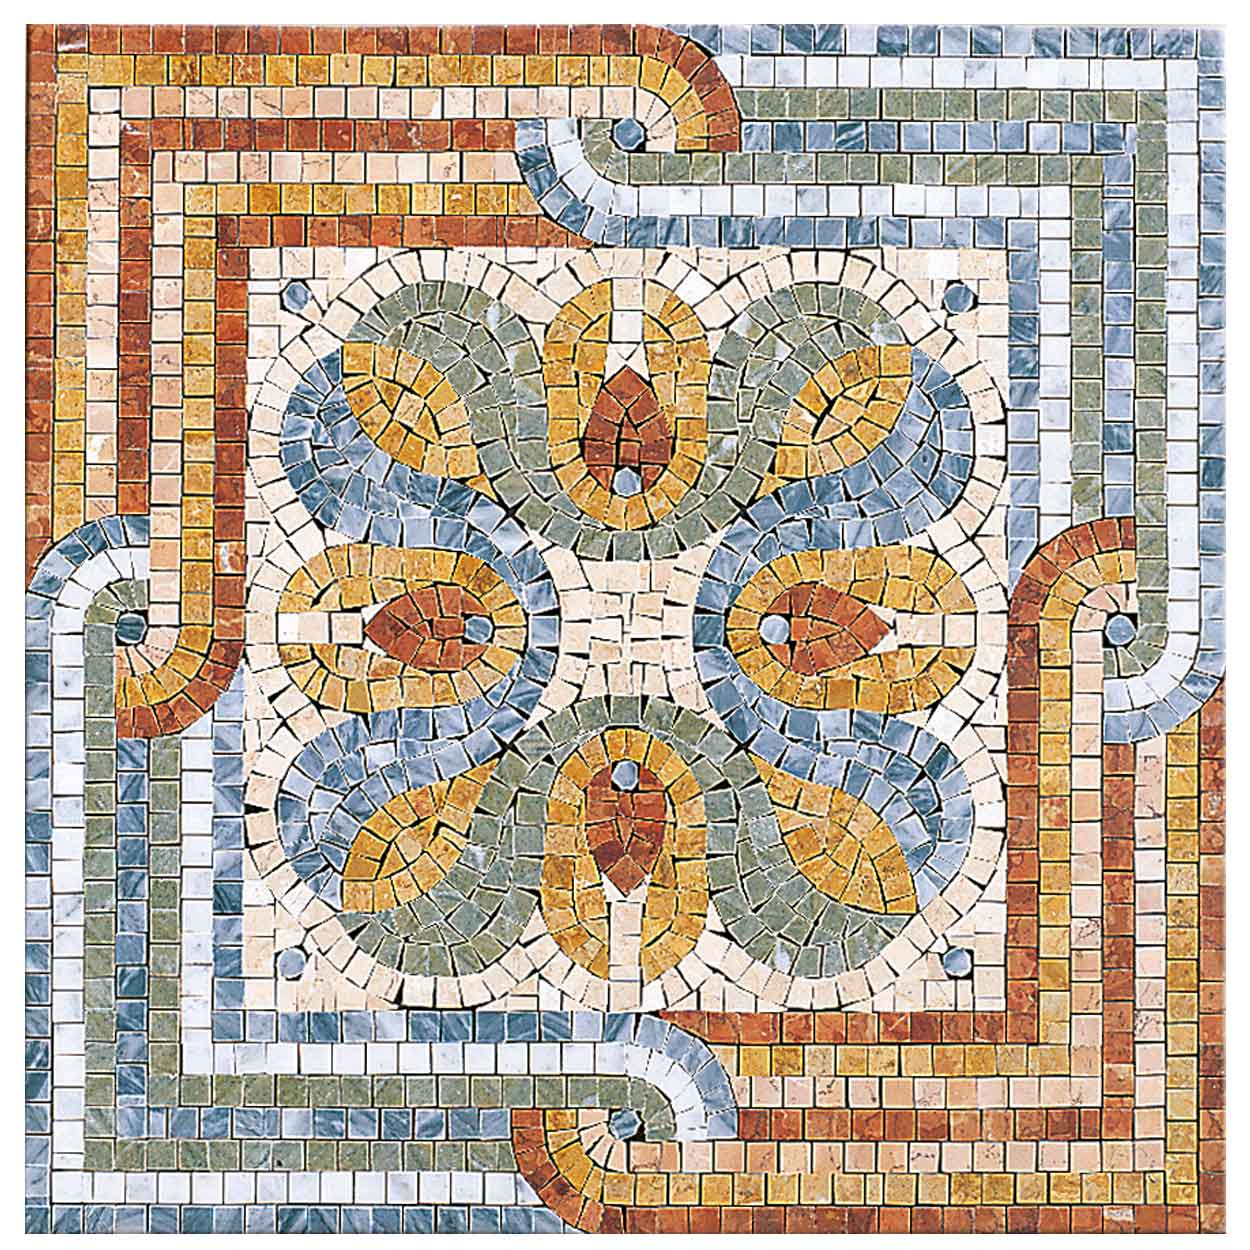 Poseidone Lithos mosaico italia